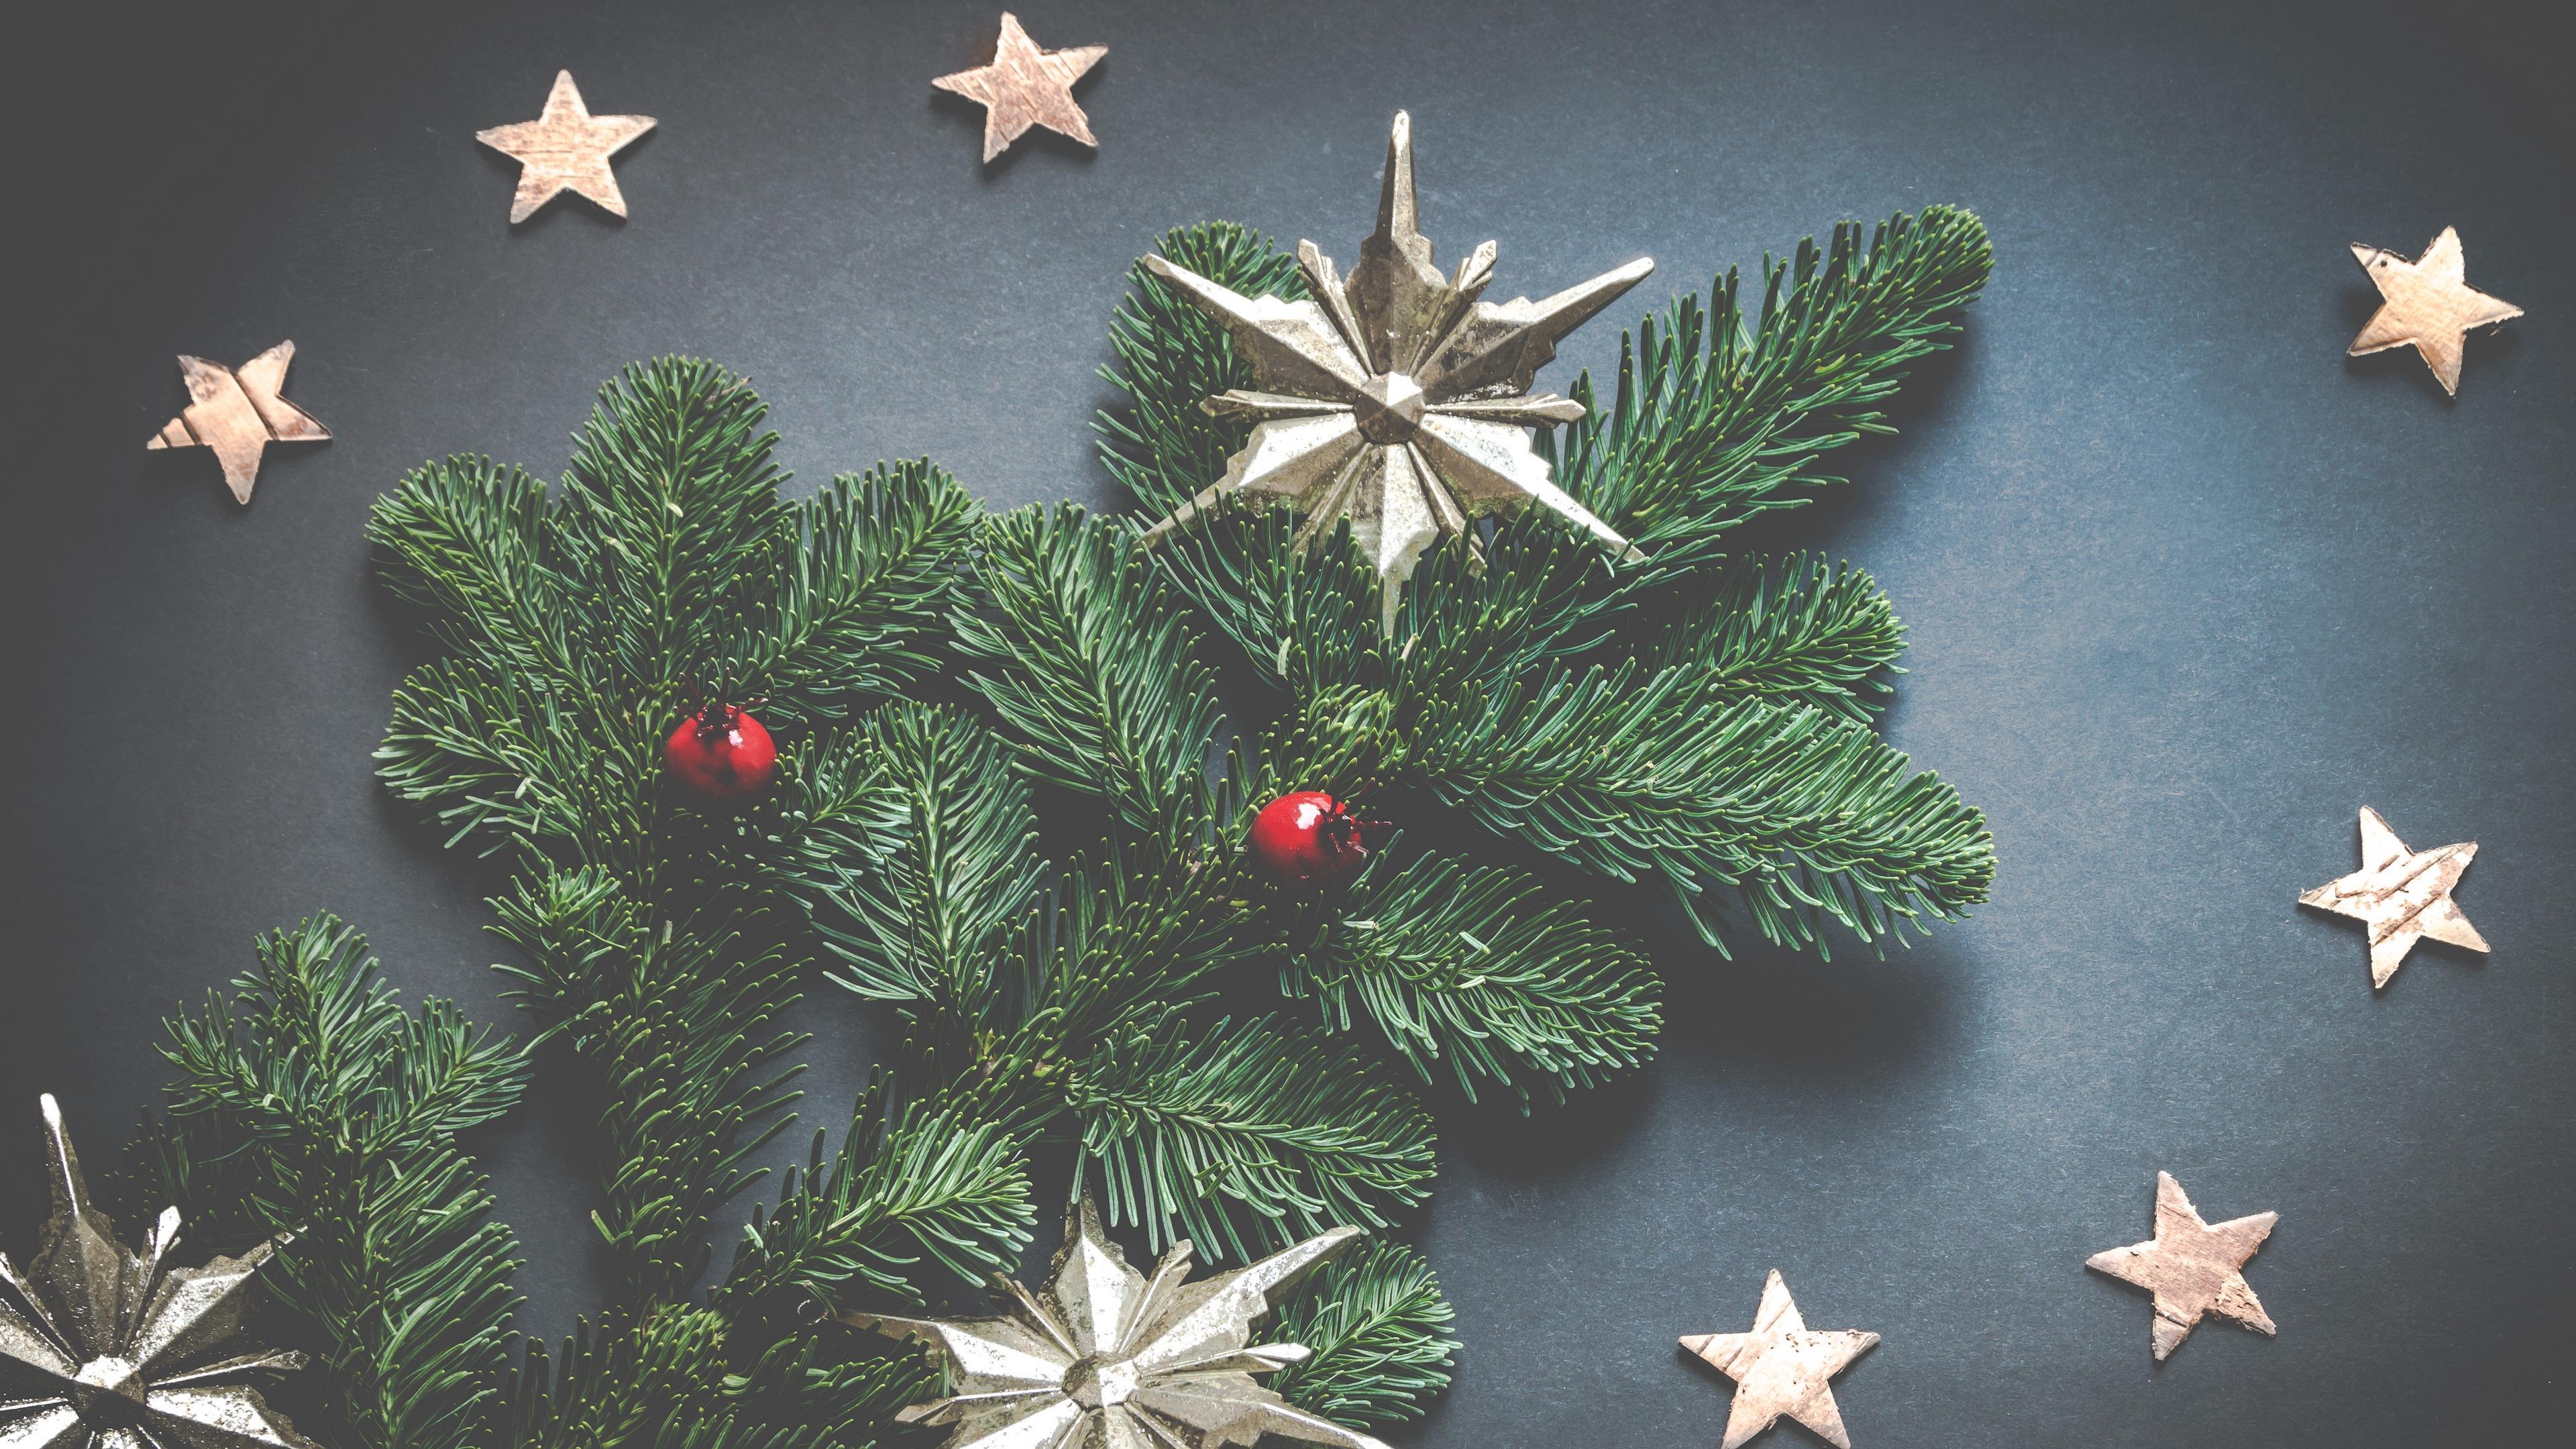 christmas decoration stars spruce 4k 1538345087 - christmas decoration, stars, spruce 4k - Stars, spruce, christmas decoration